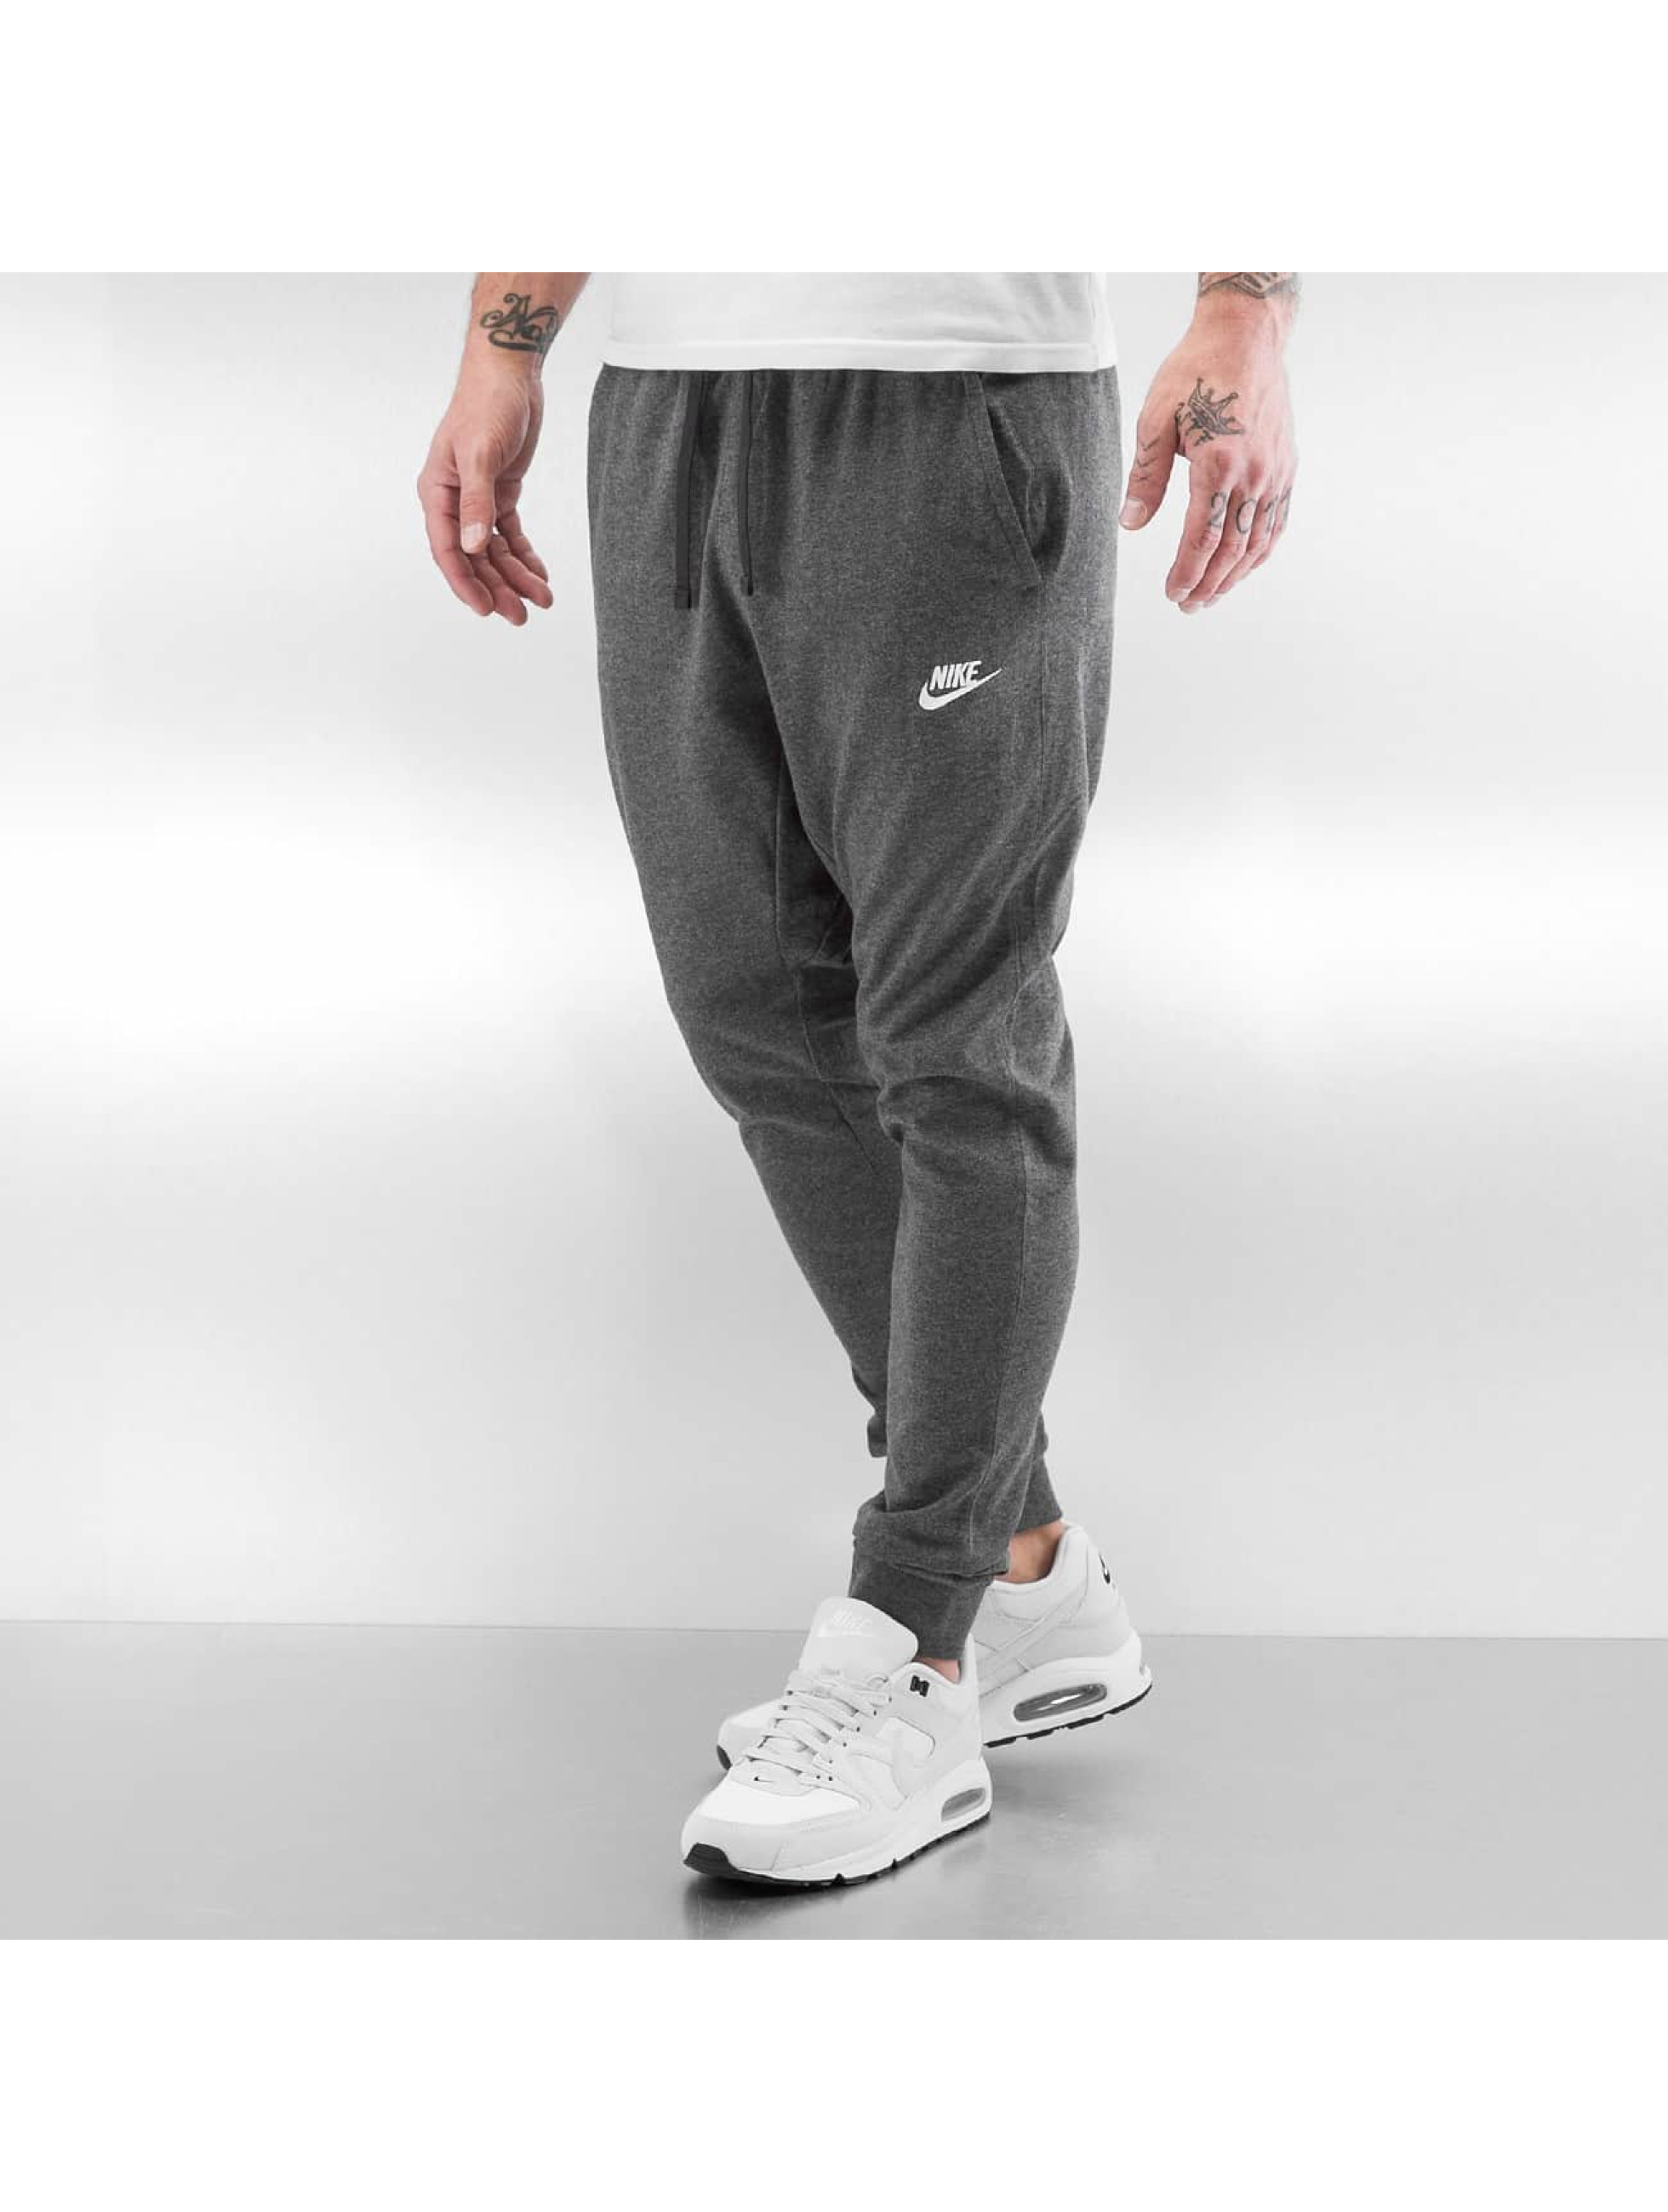 nike herren jogginghose sportswear in grau 285934. Black Bedroom Furniture Sets. Home Design Ideas